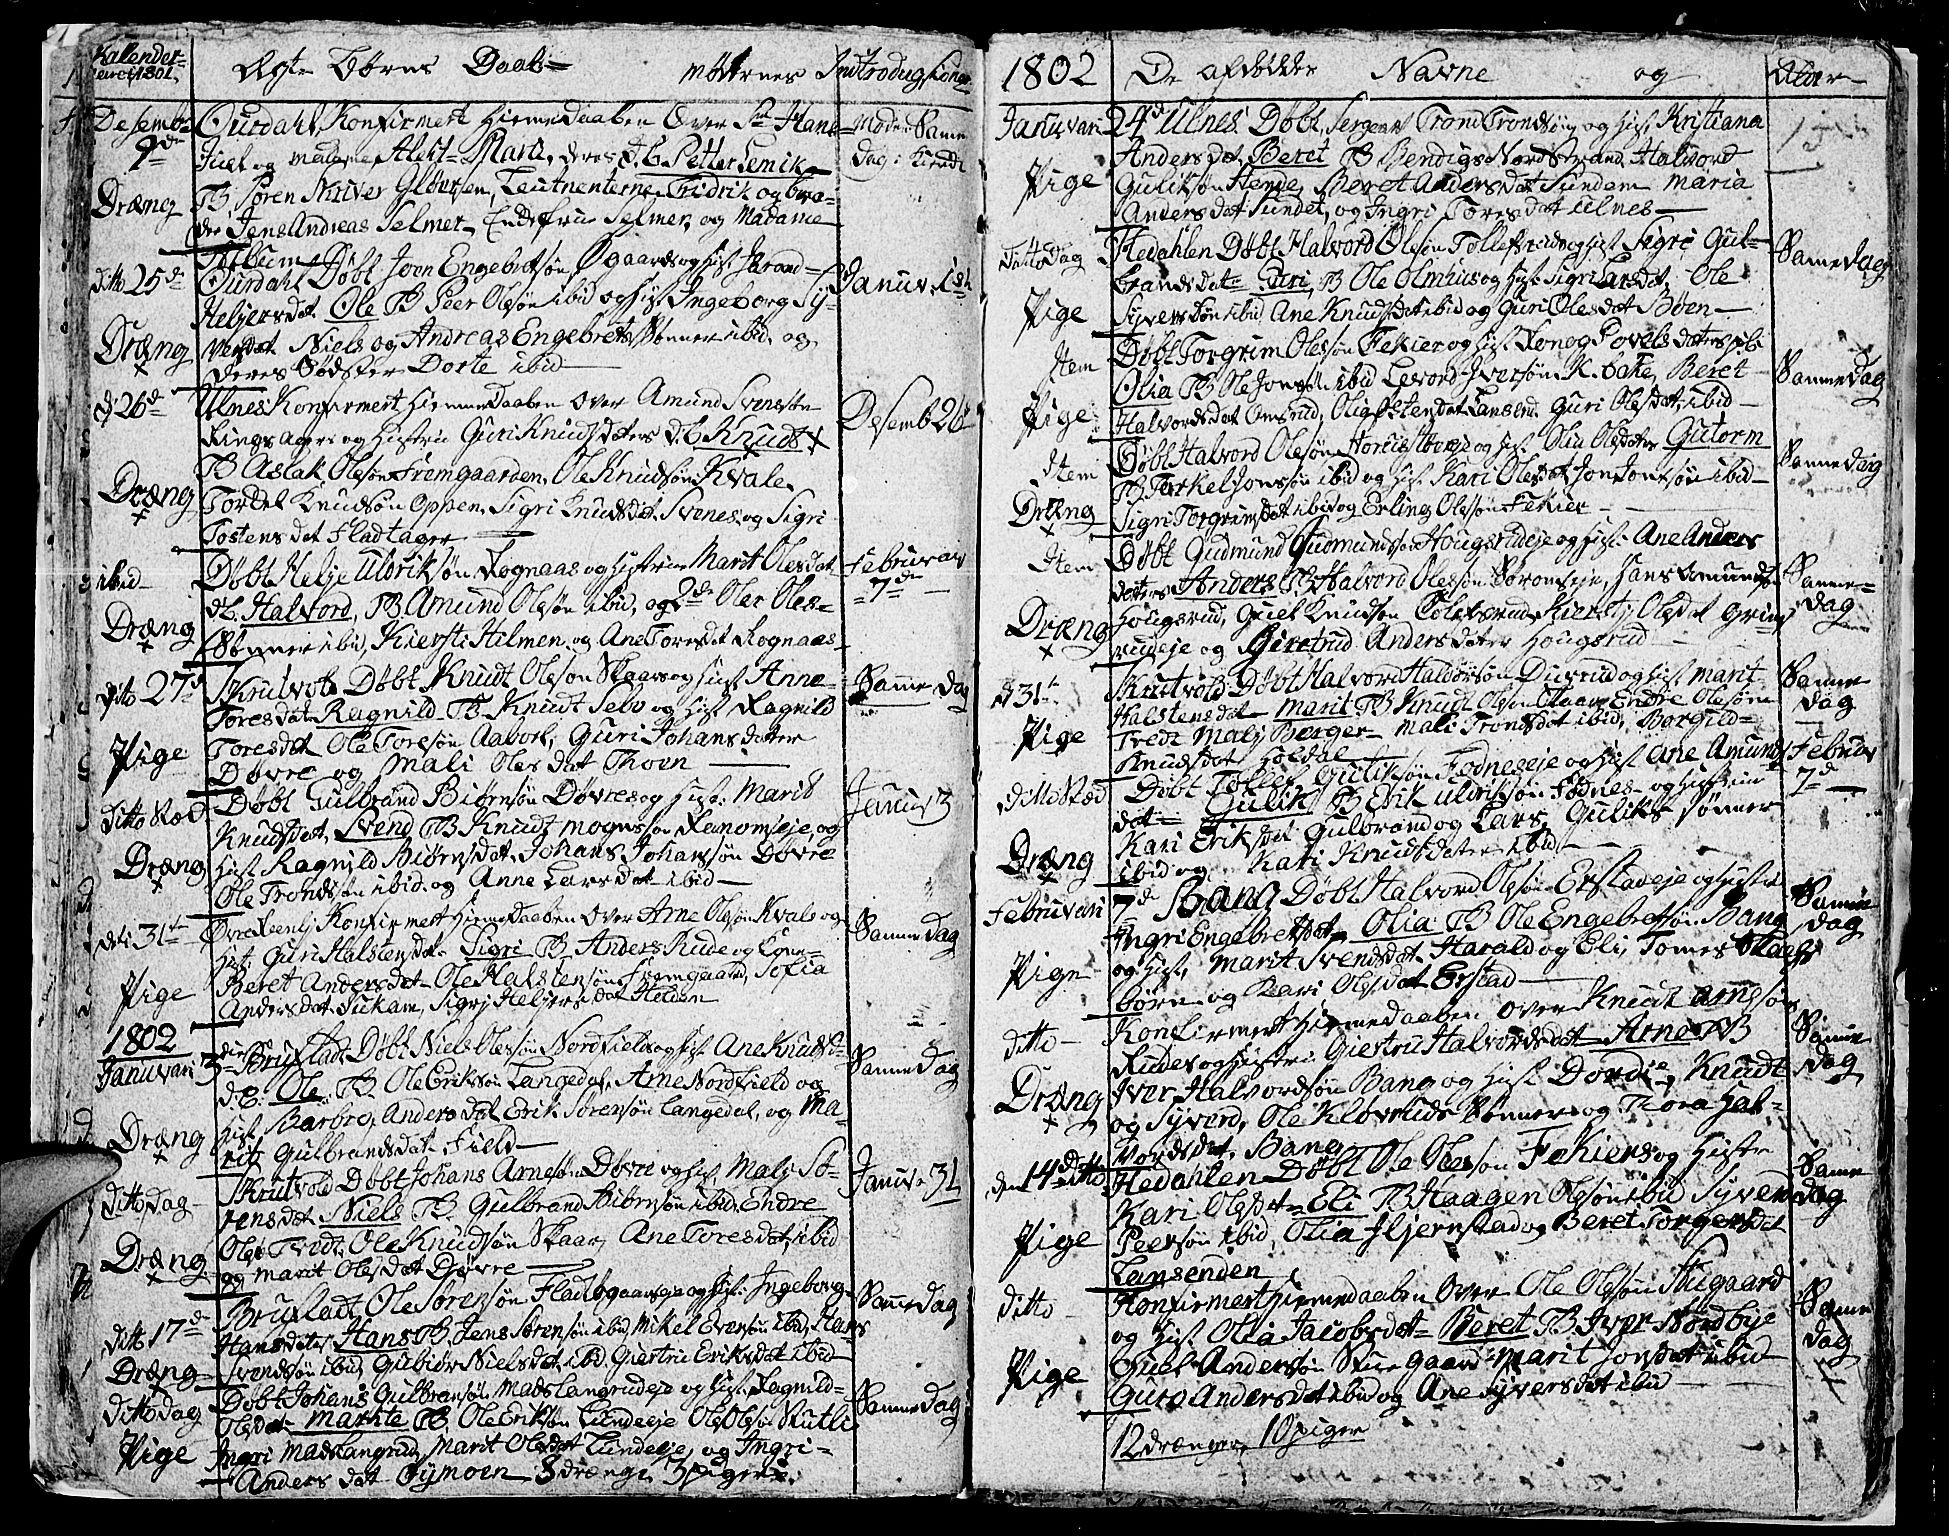 SAH, Aurdal prestekontor, Ministerialbok nr. 7, 1800-1808, s. 15